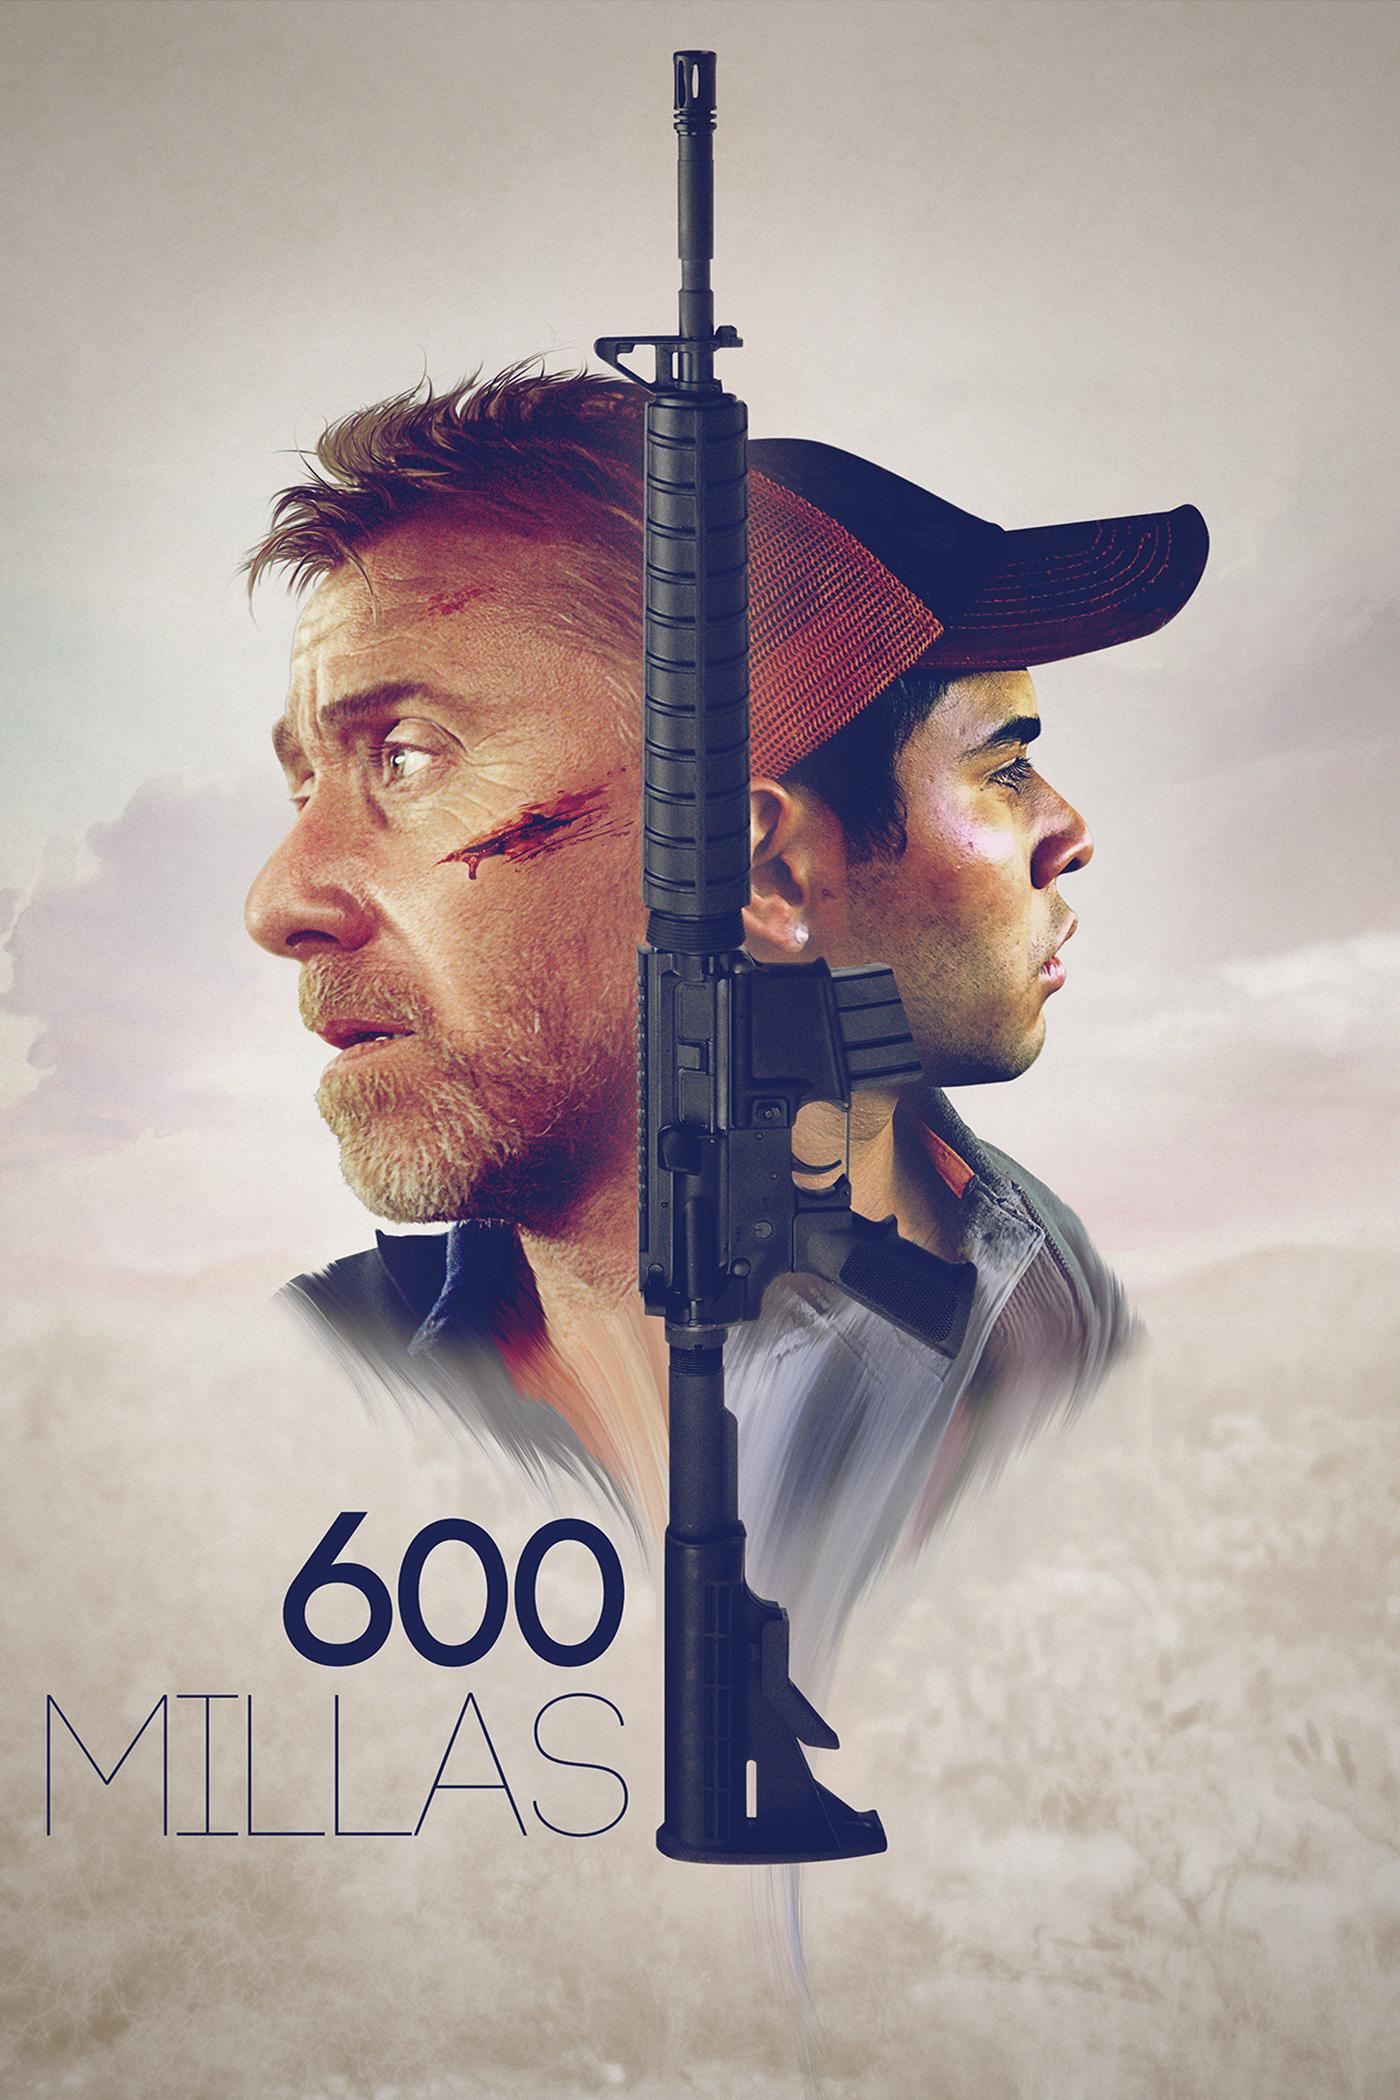 600 Millas Poster.jpg